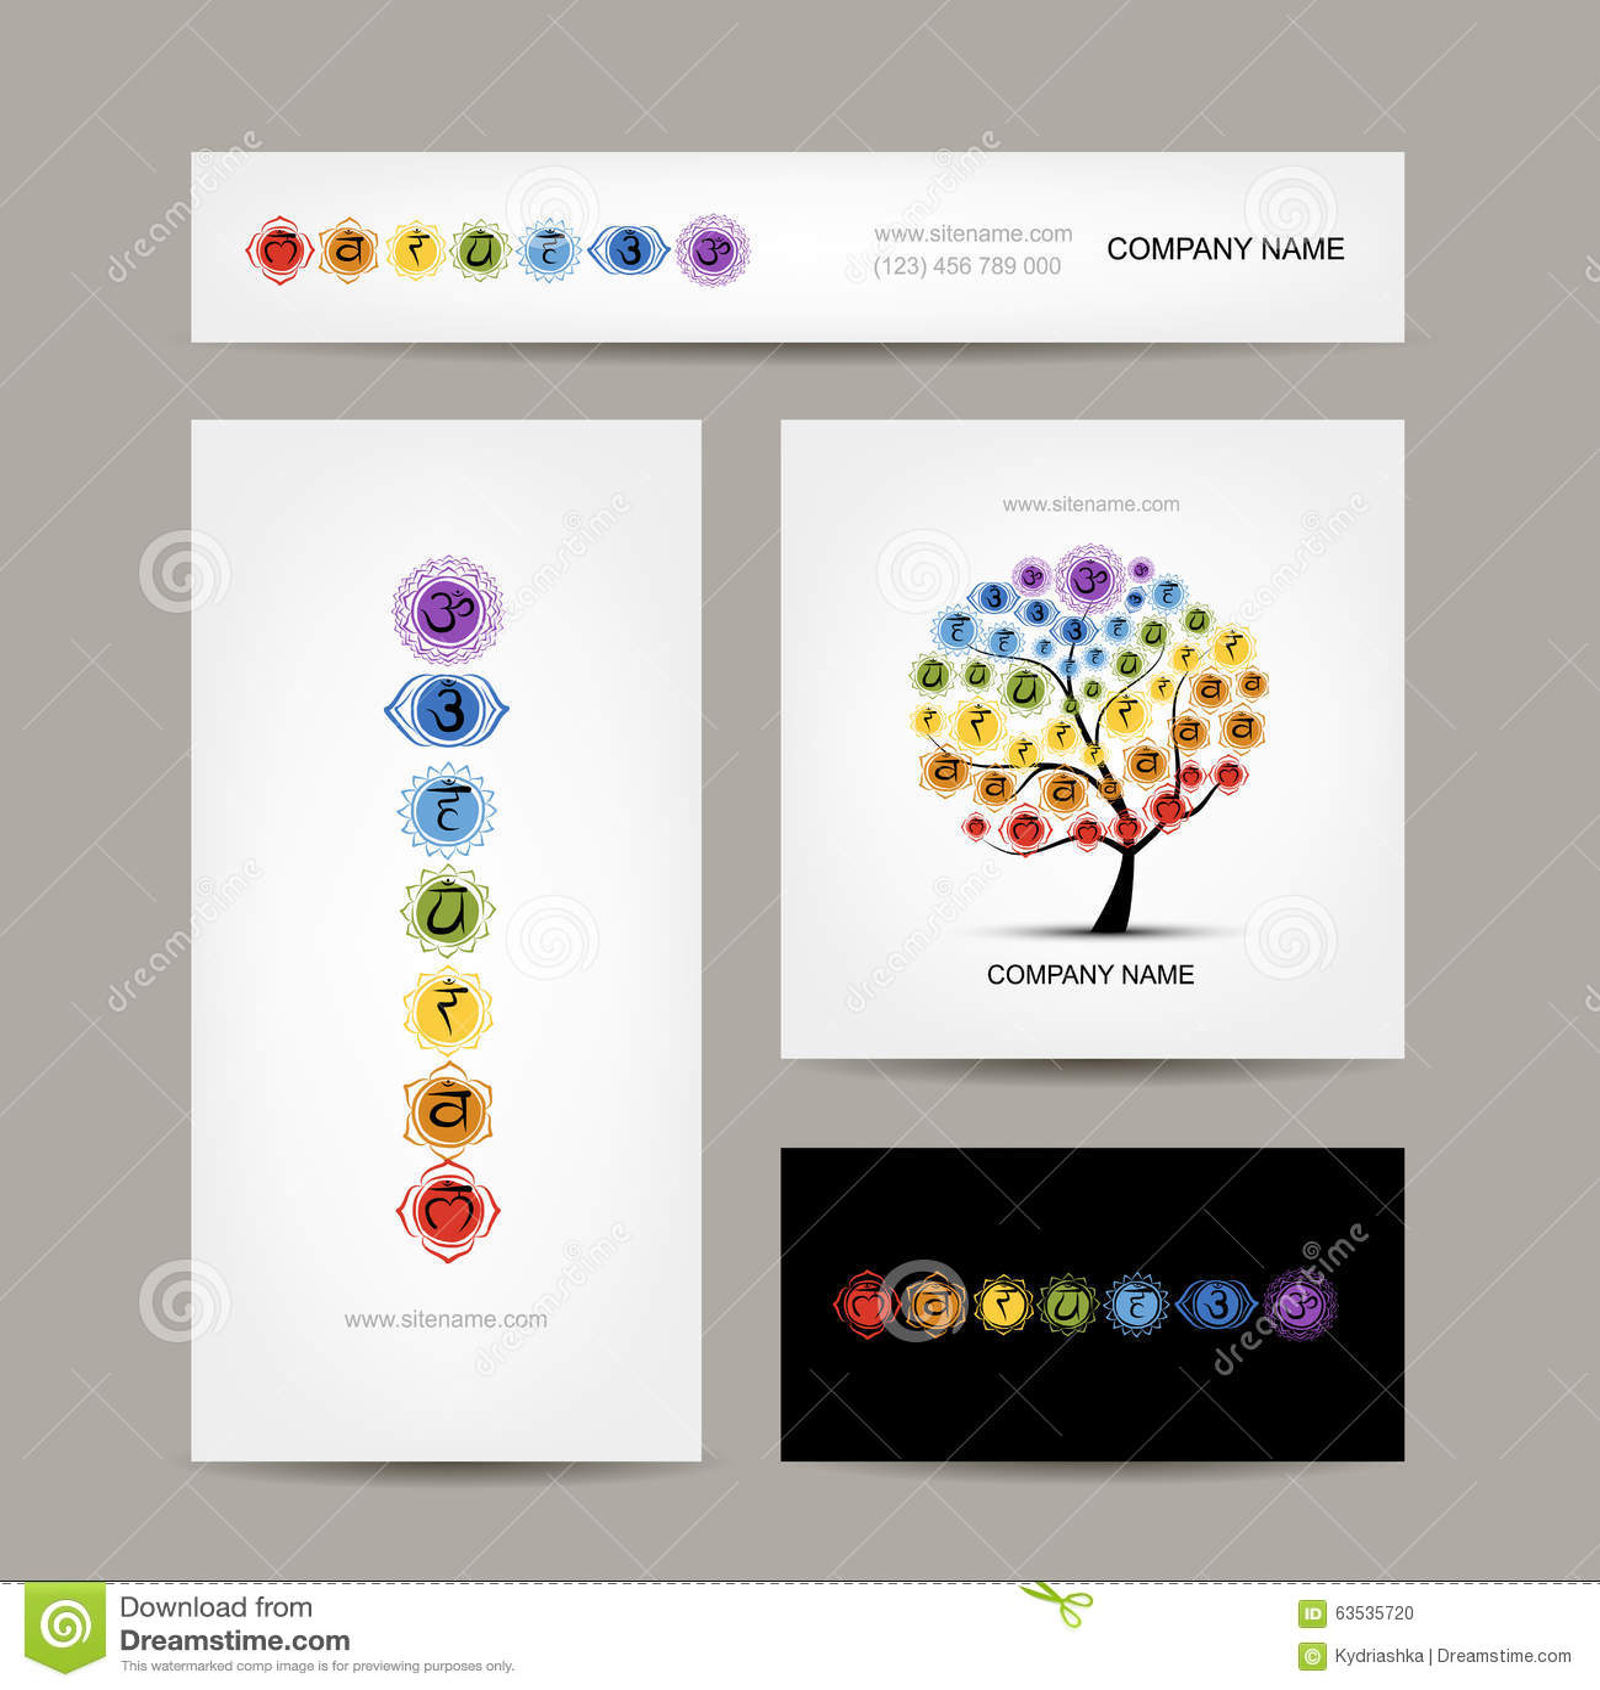 Business Cards Design Seven Main Chakras Stock Vector